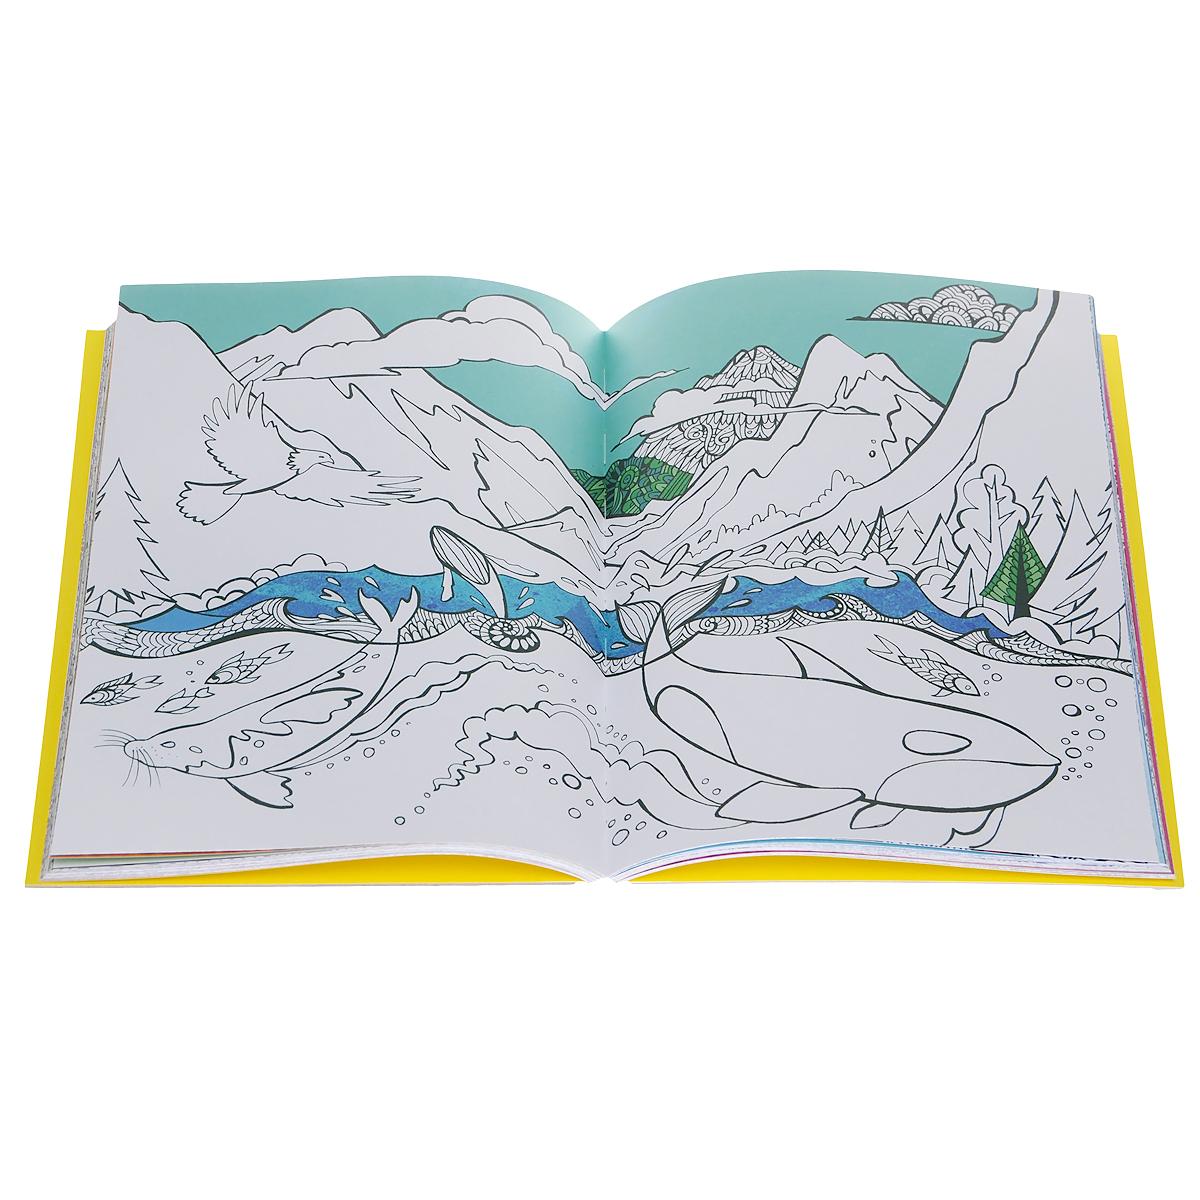 Cindy Wilde, Laura-Kate Chapman, Richard Merritt. Colour Therapy: An Anti-Stress Colouring Book